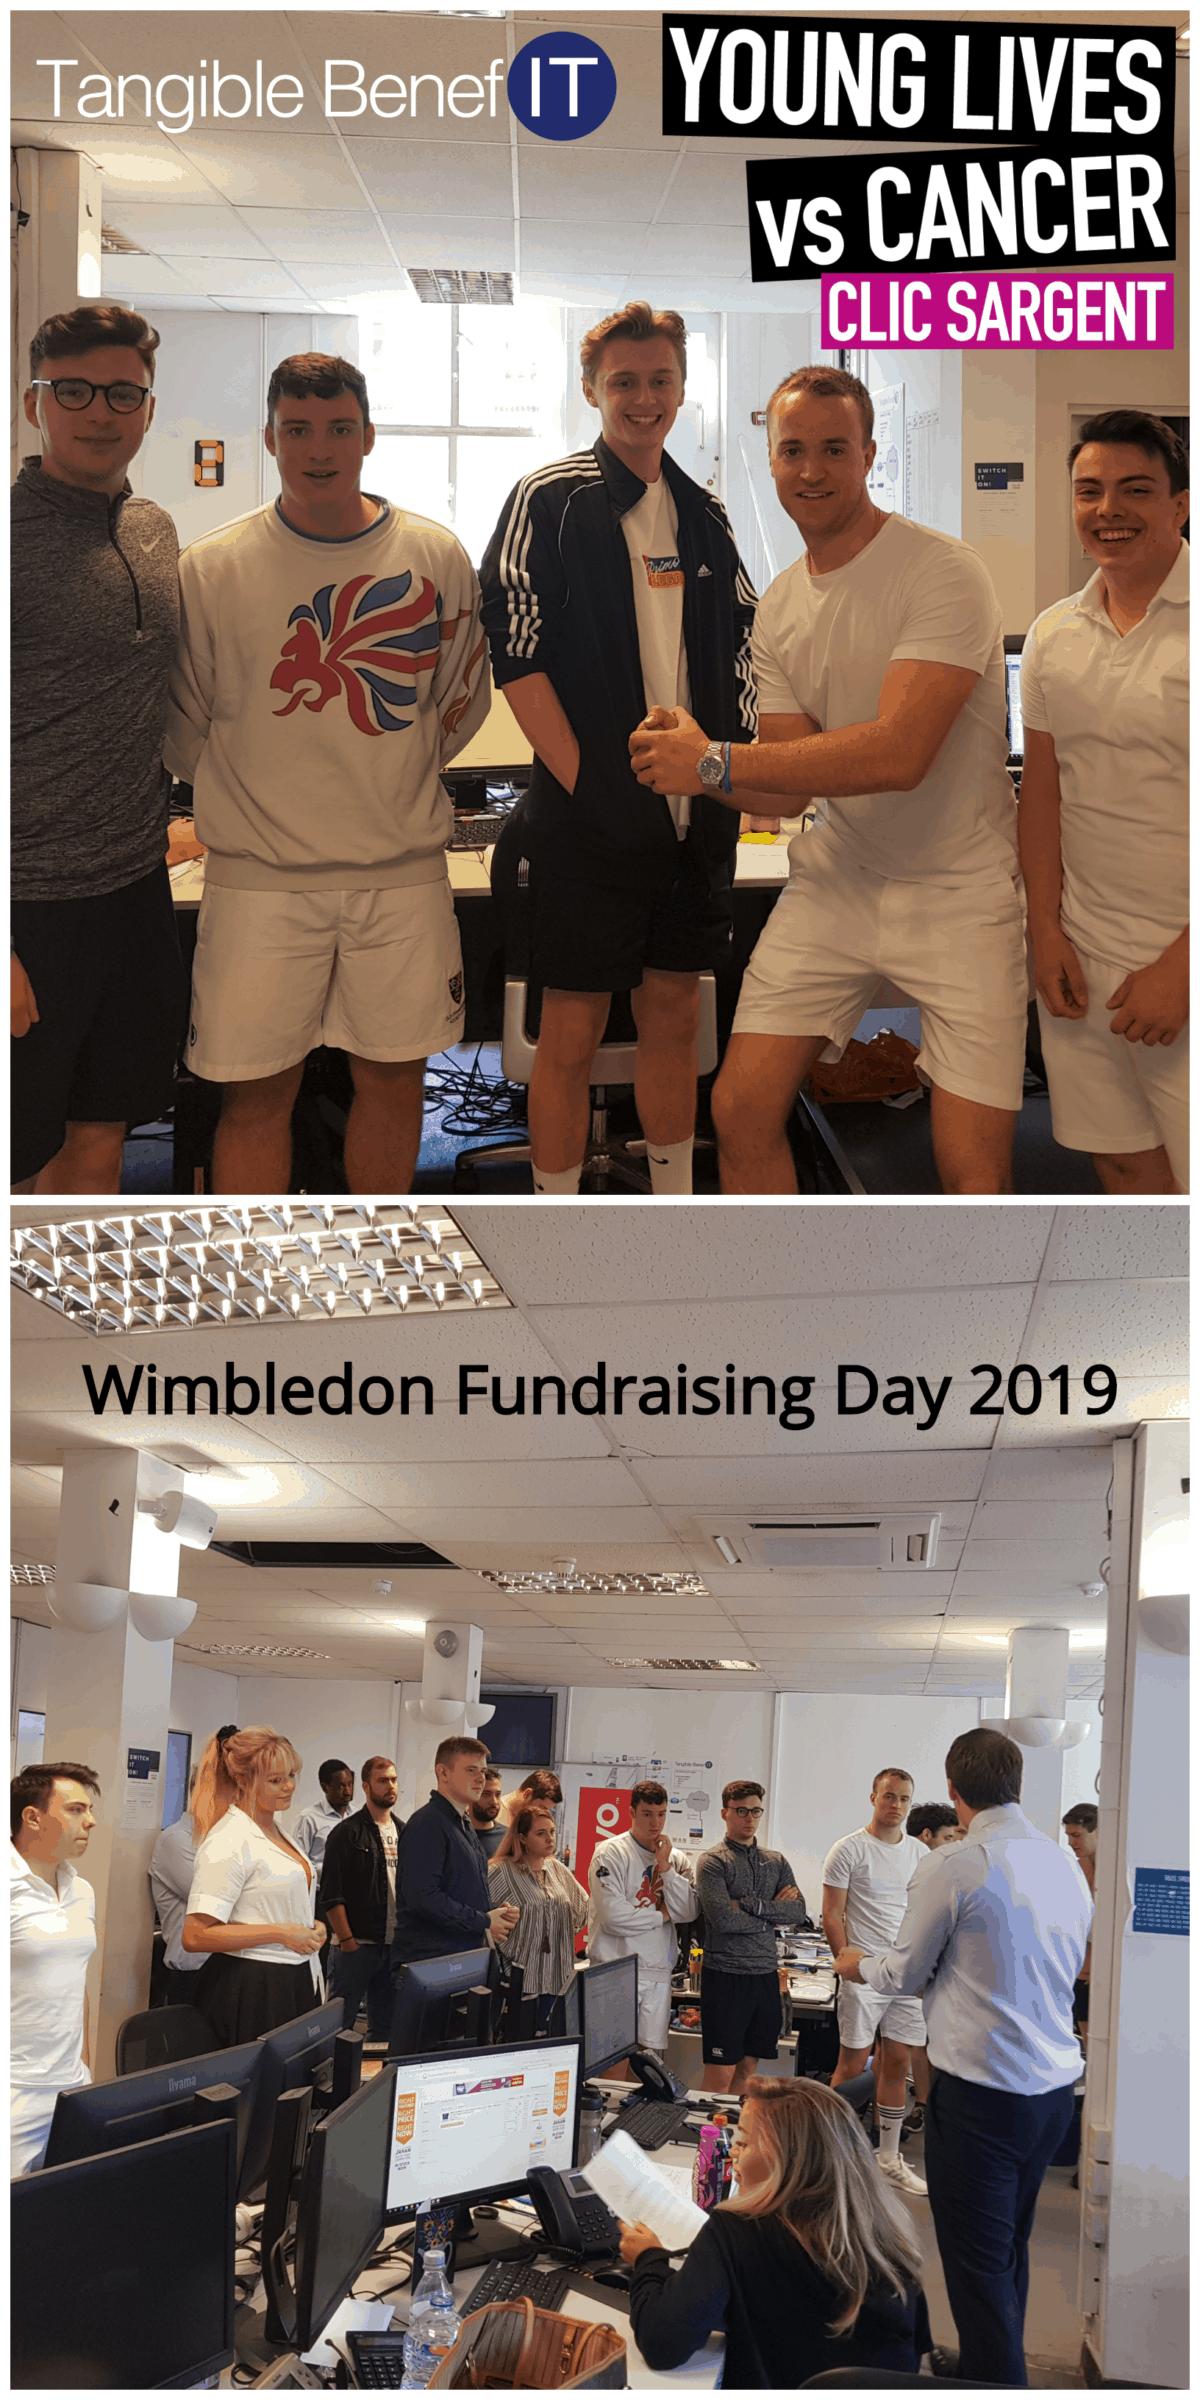 Wimbledone fundraising day 2019